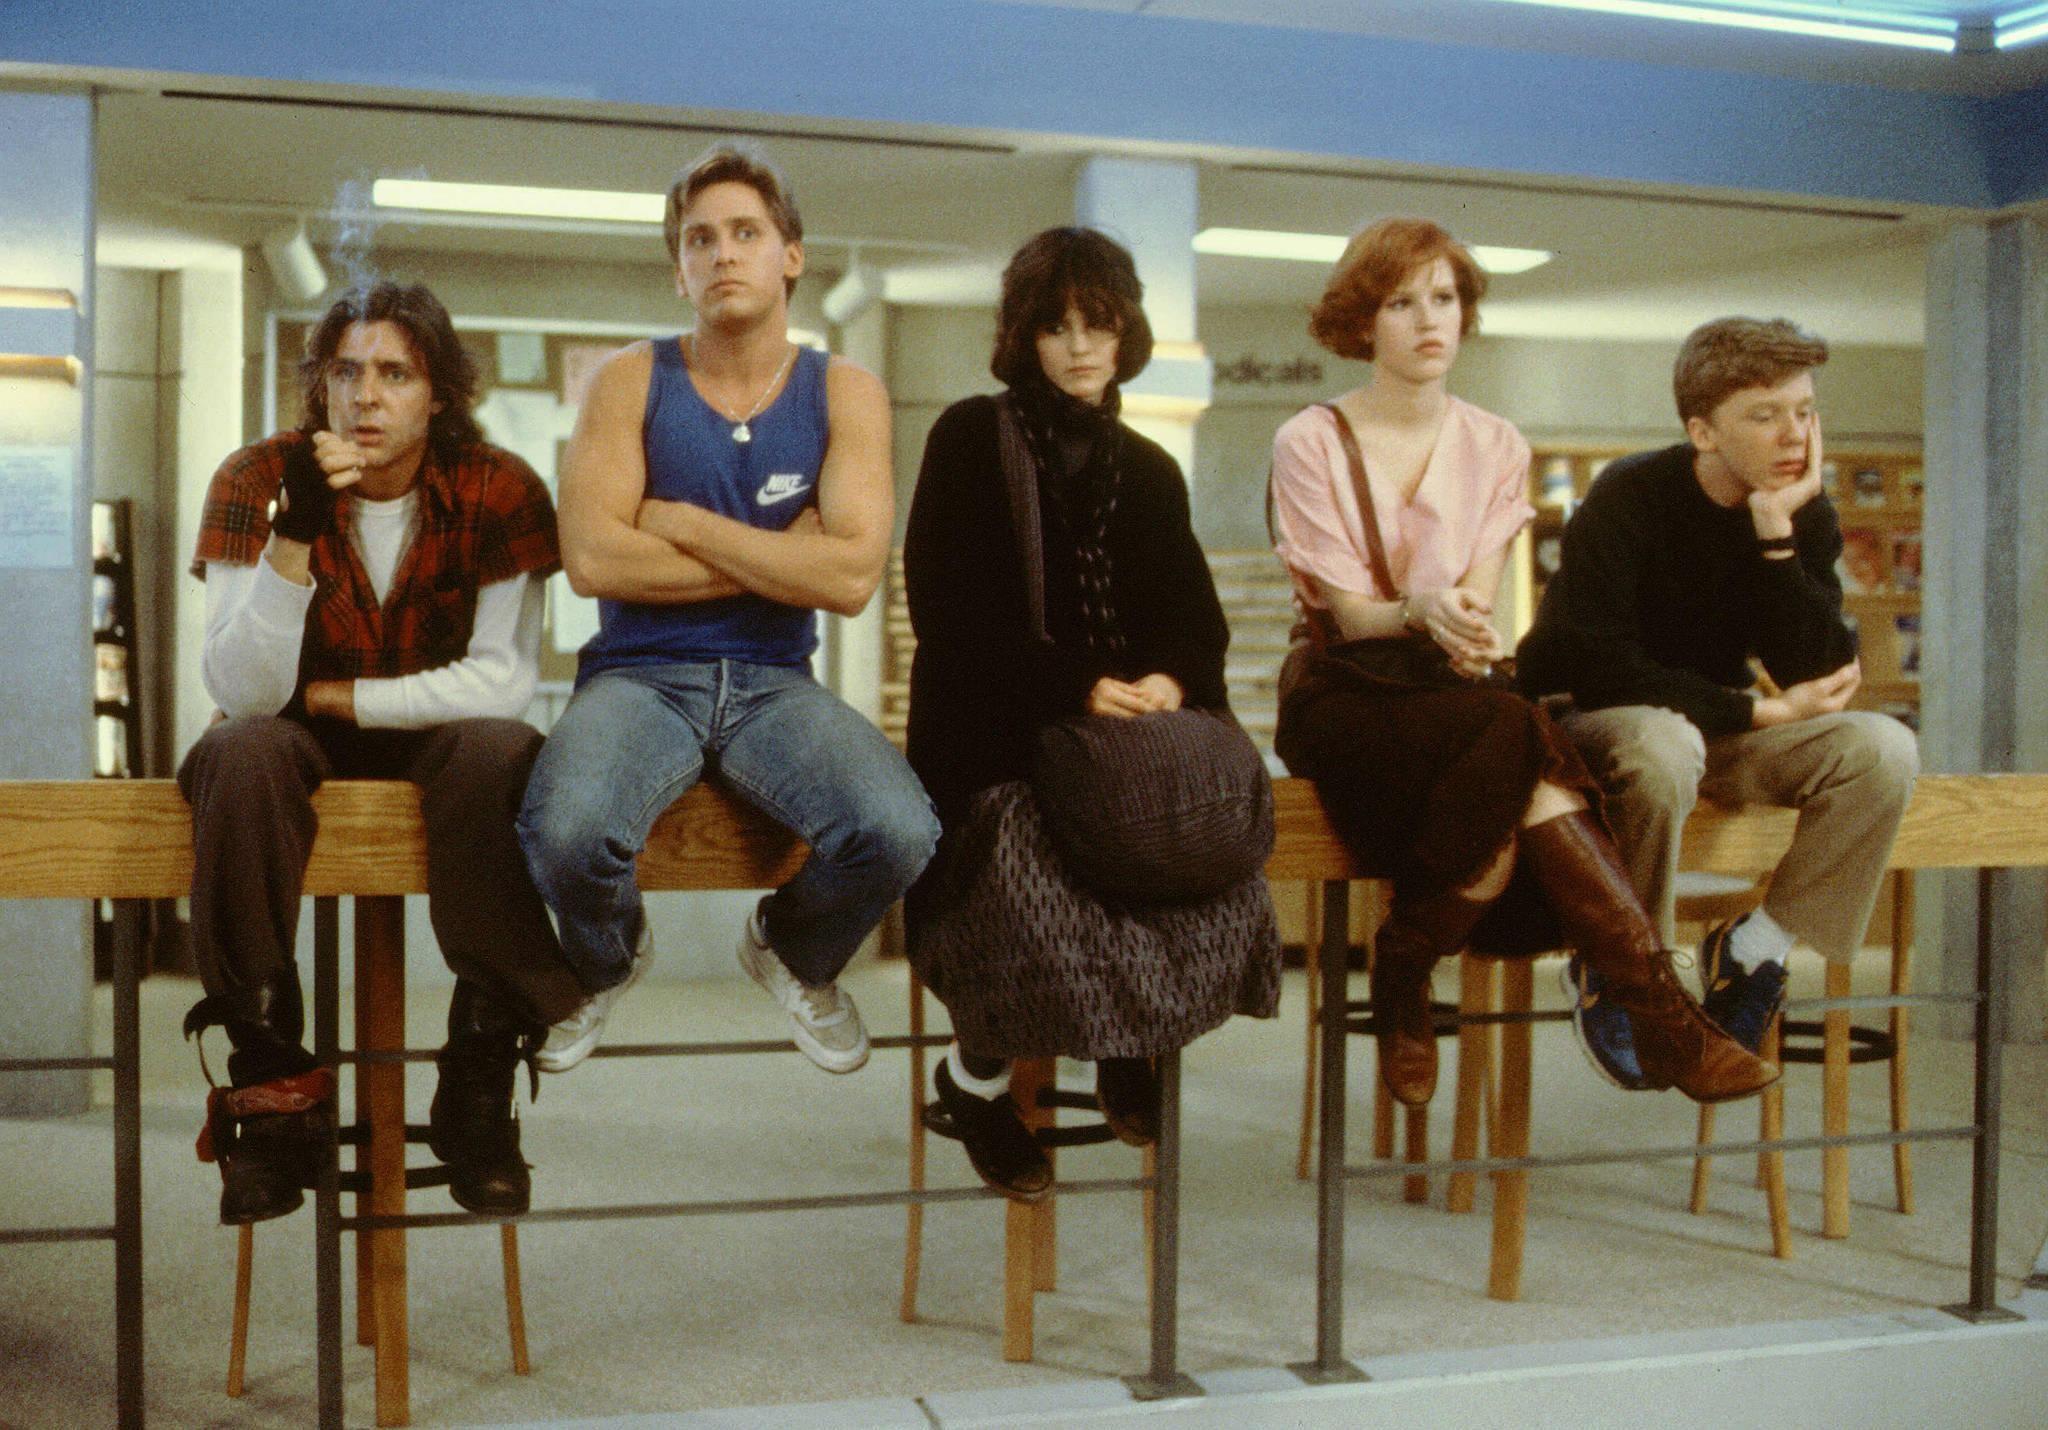 Still of Molly Ringwald, Emilio Estevez, Judd Nelson, Ally Sheedy and Anthony Michael Hall in The Breakfast Club (1985) http://www.movpins.com/dHQwMDg4ODQ3/the-breakfast-club-(1985)/still-1290438144